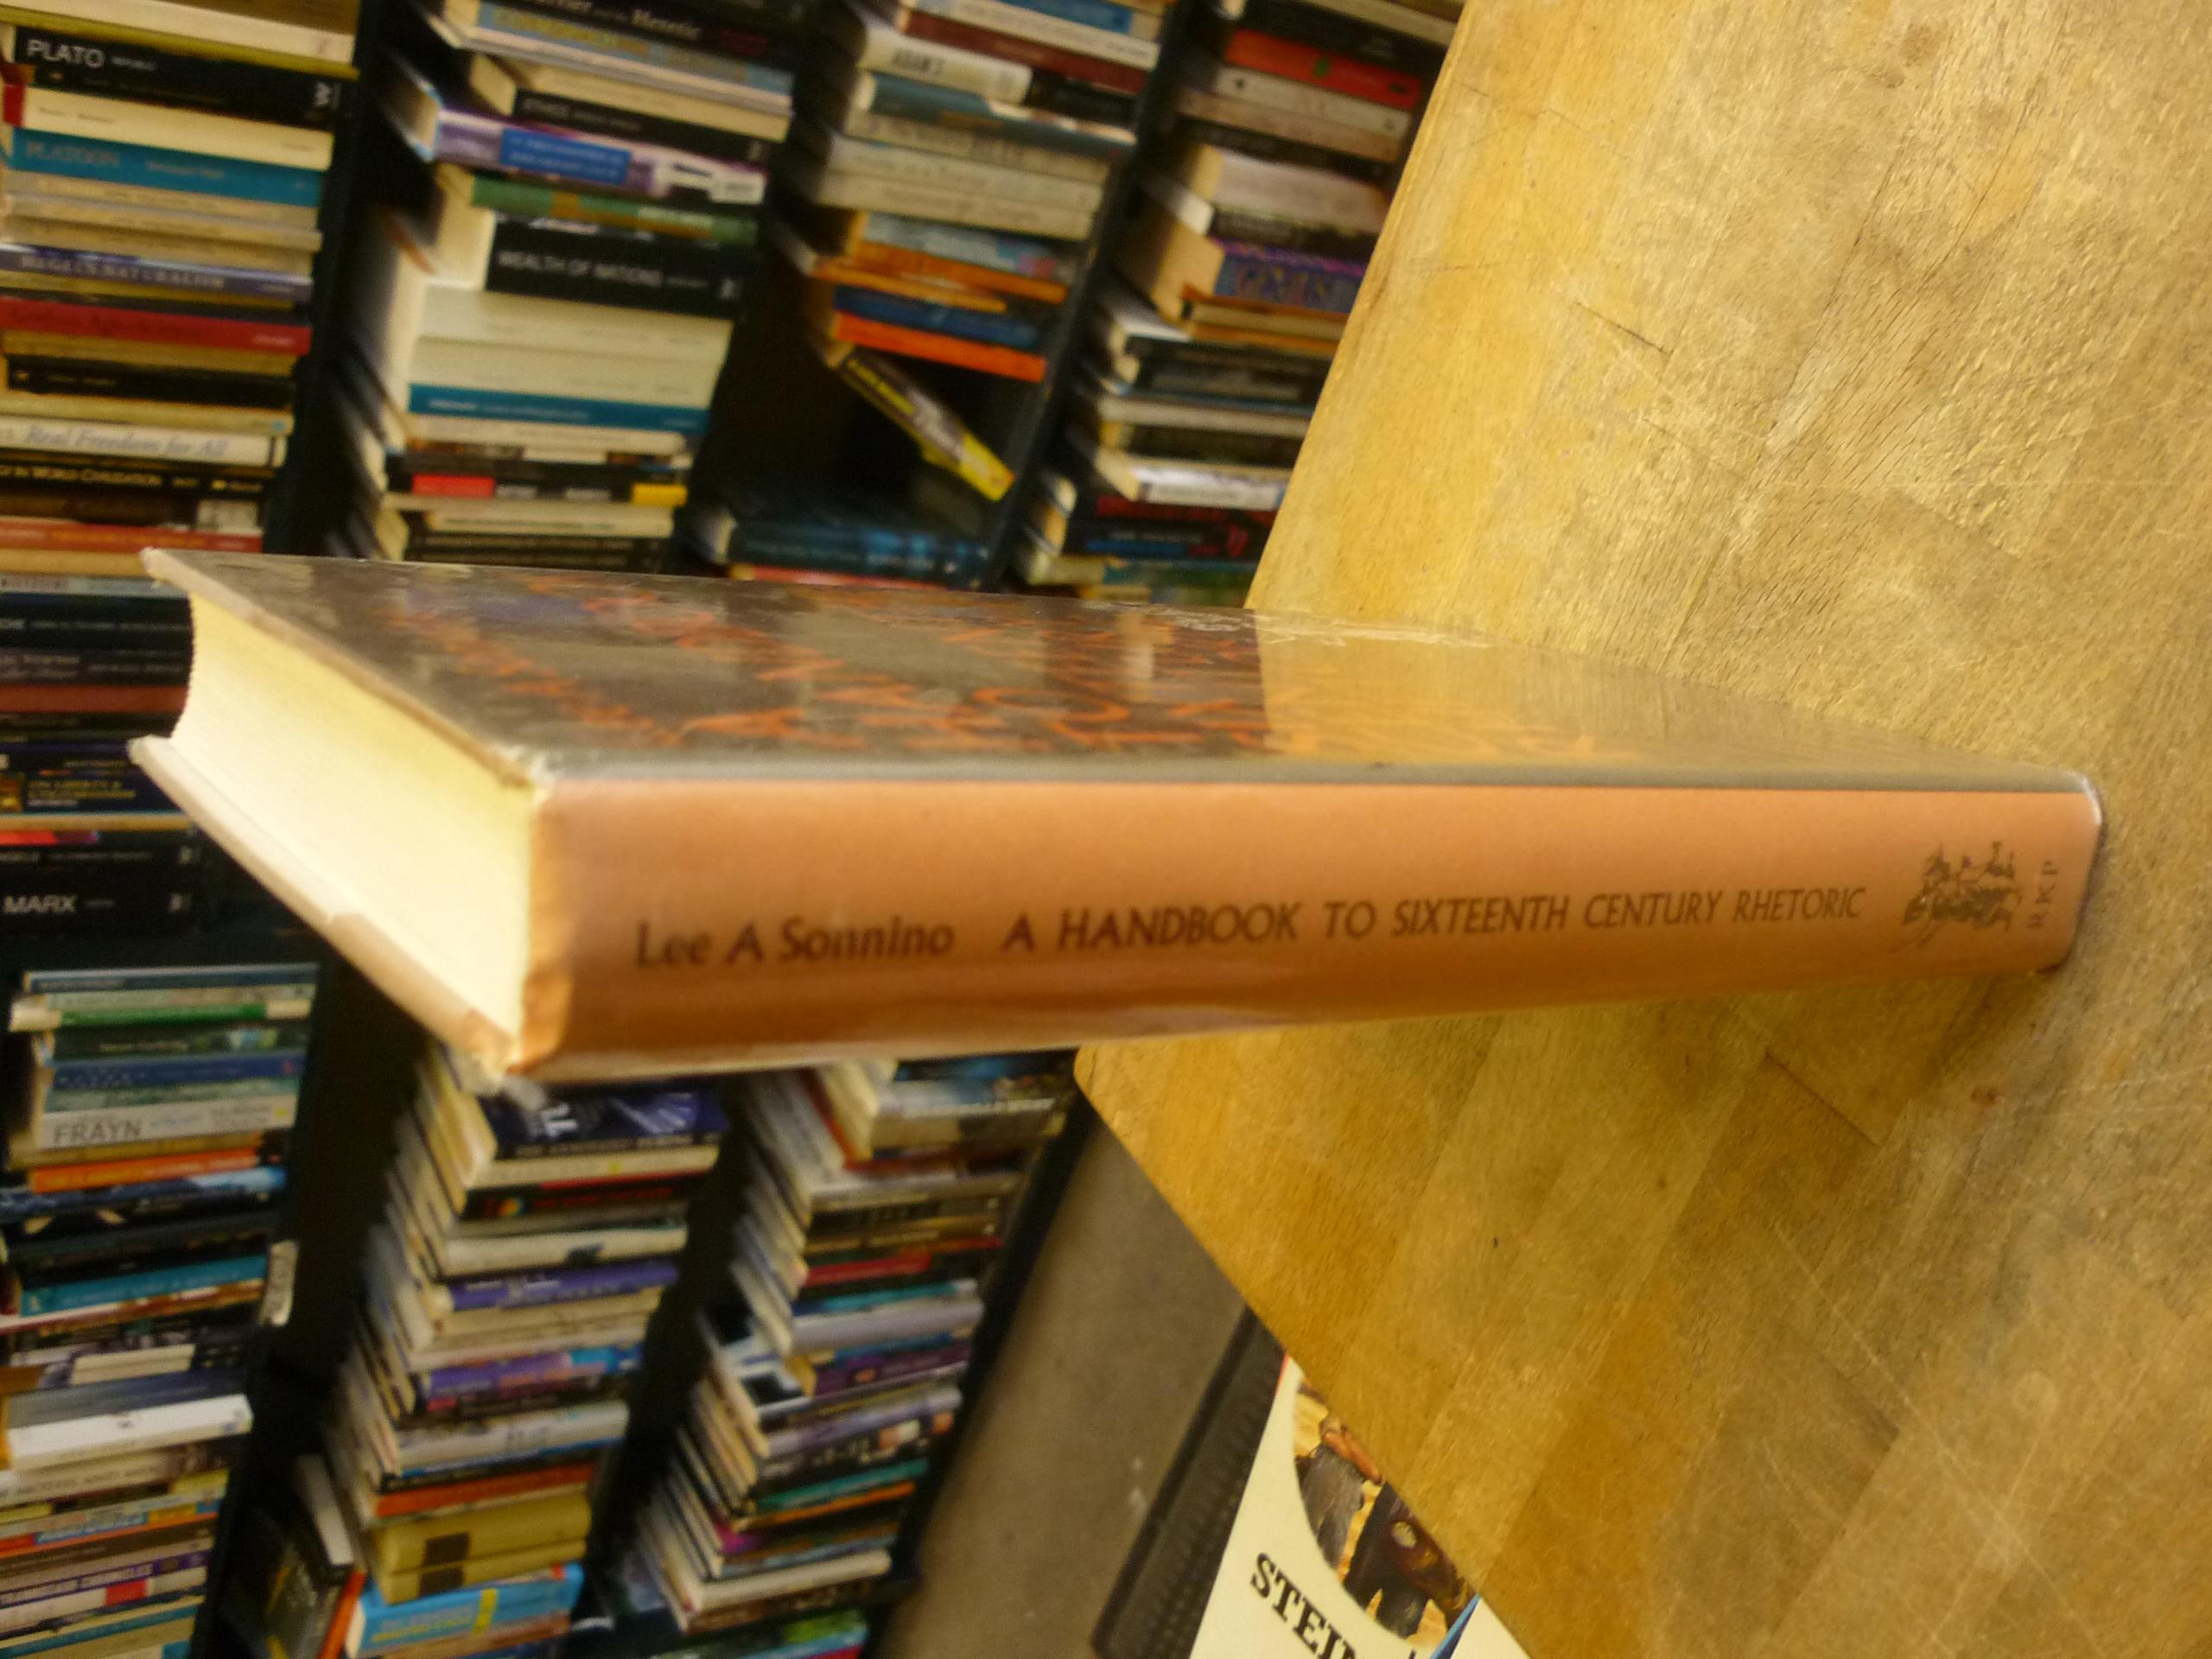 Handbook to Sixteenth Century Rhetoric